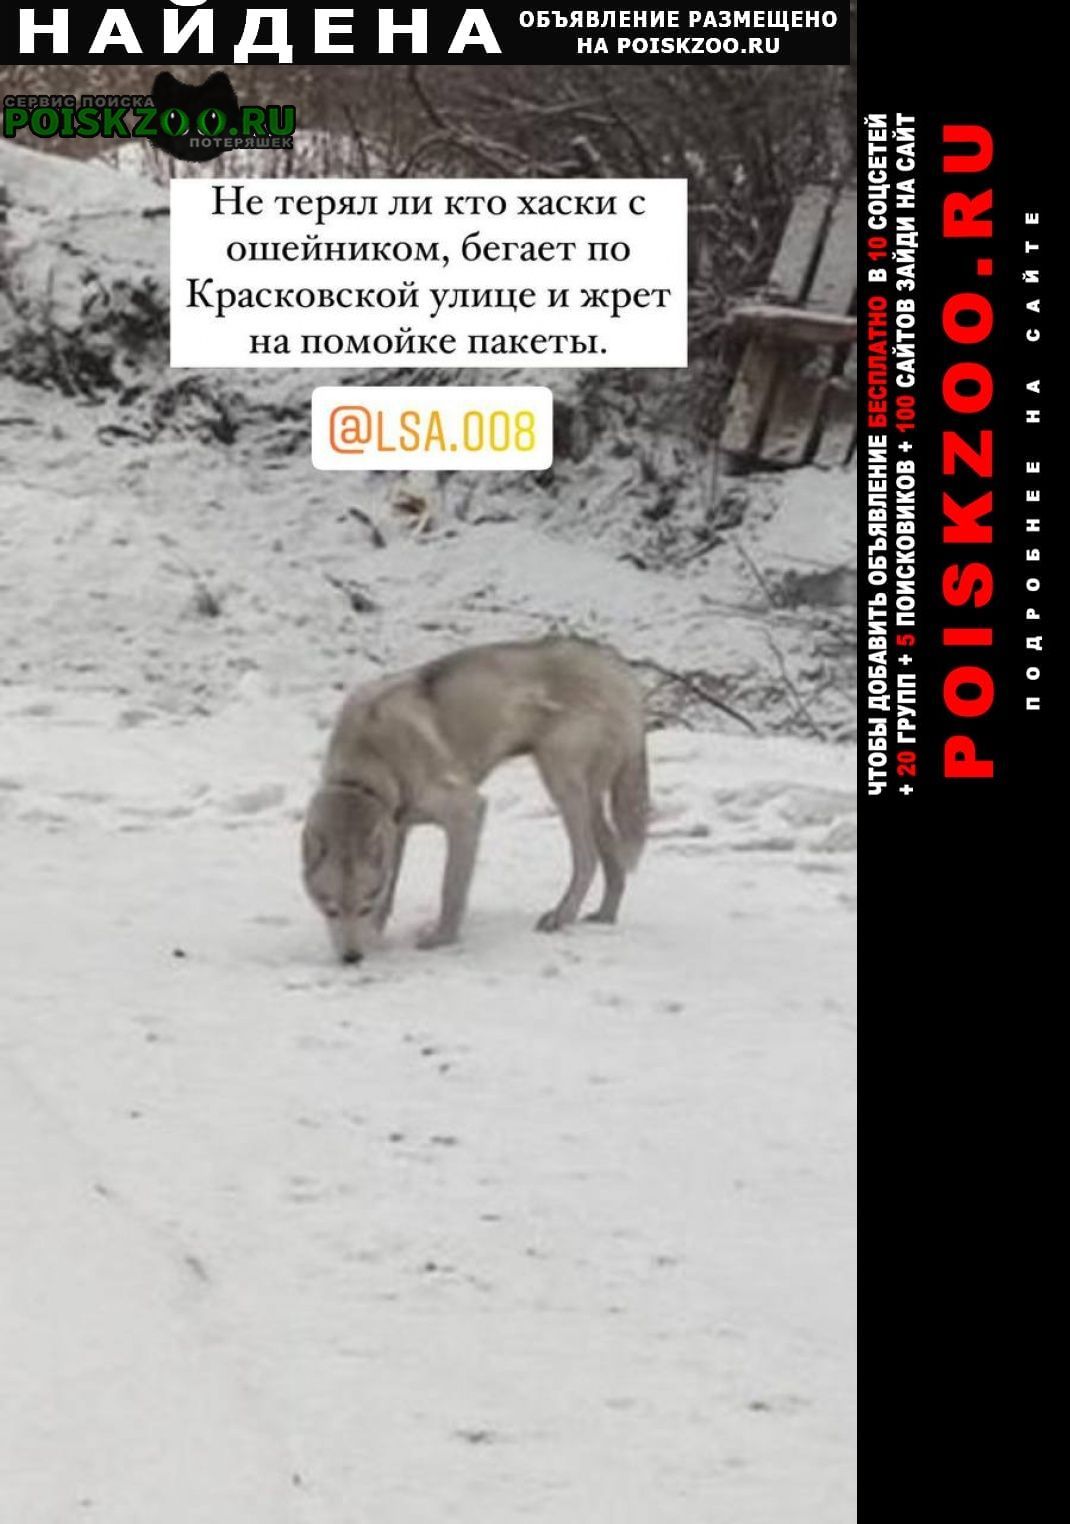 Найдена собака кобель обнаружен хаски Москва